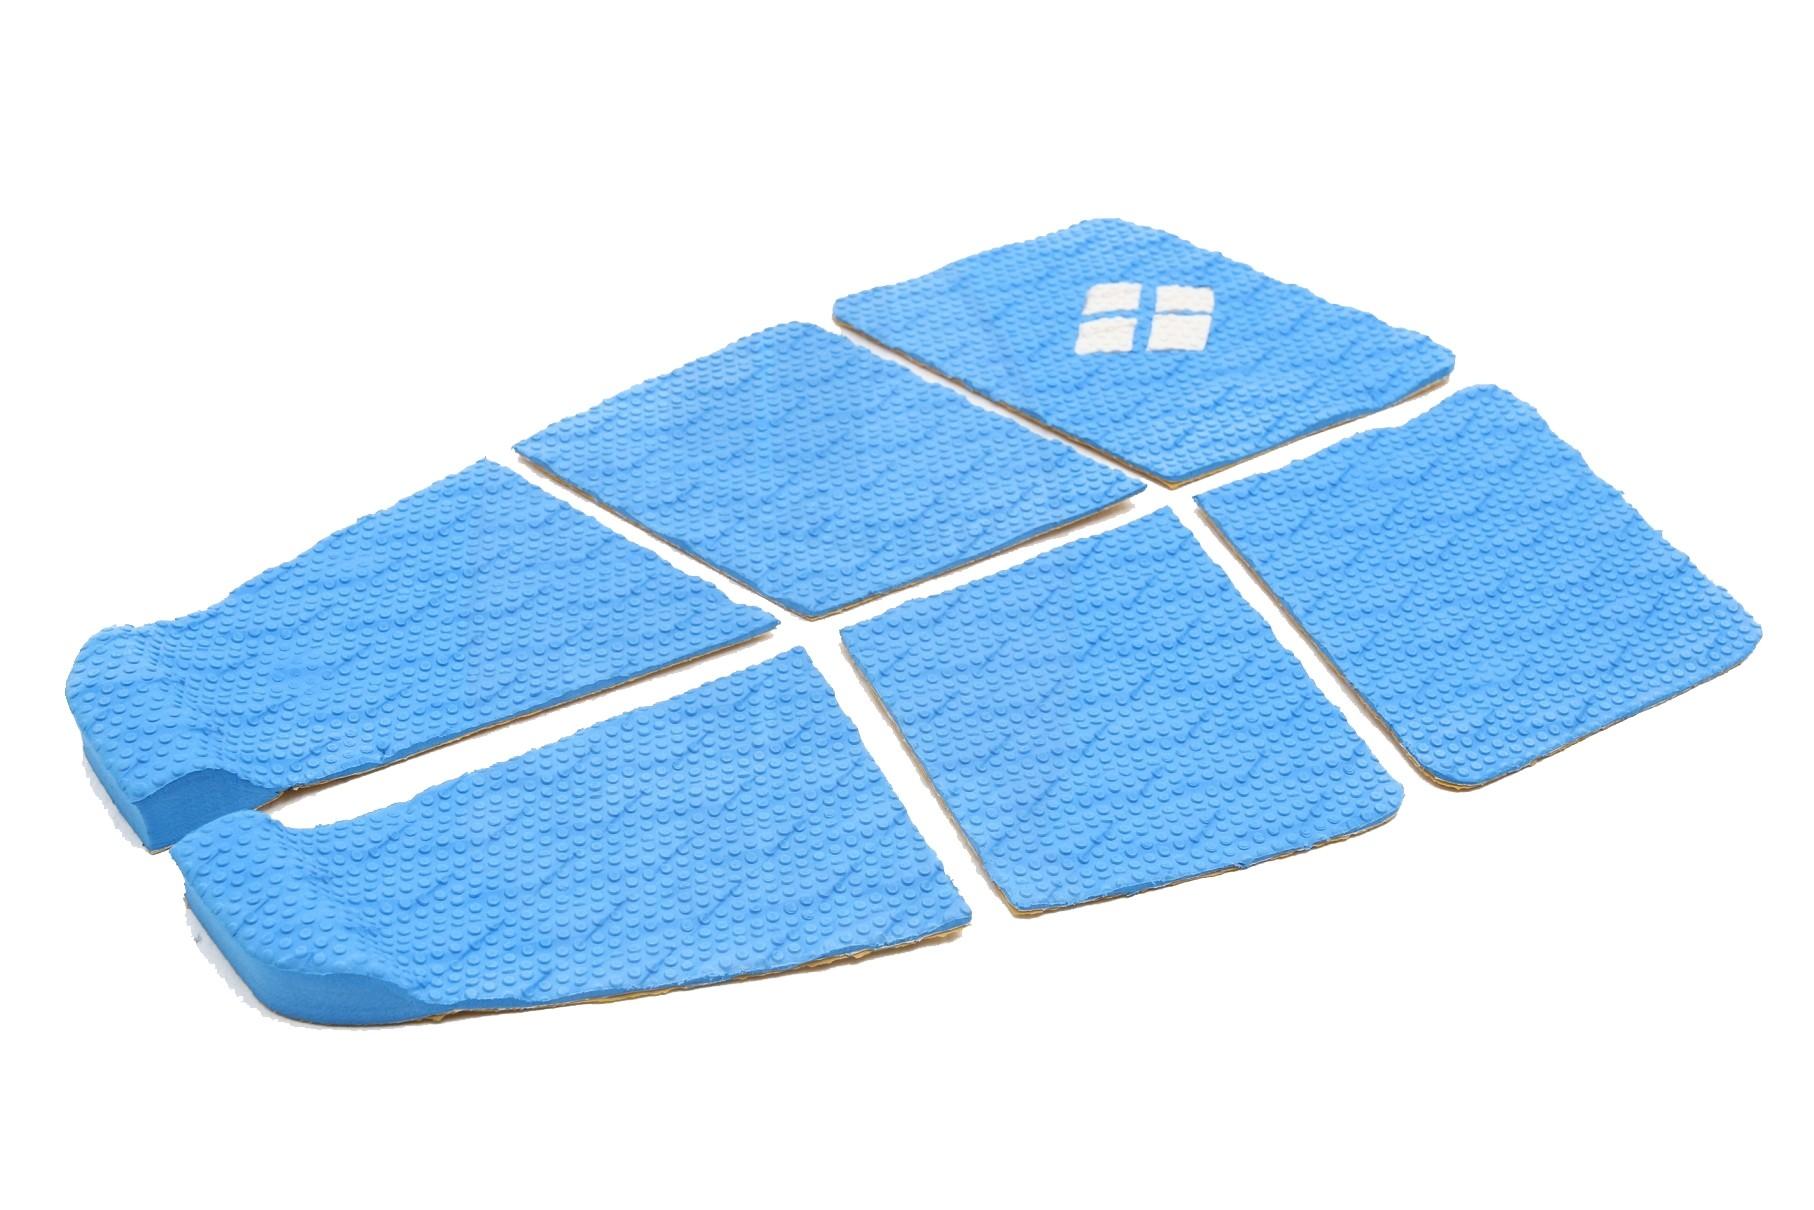 Deck Surf 6 Partes Rubber Sticky Azul | Prancharia